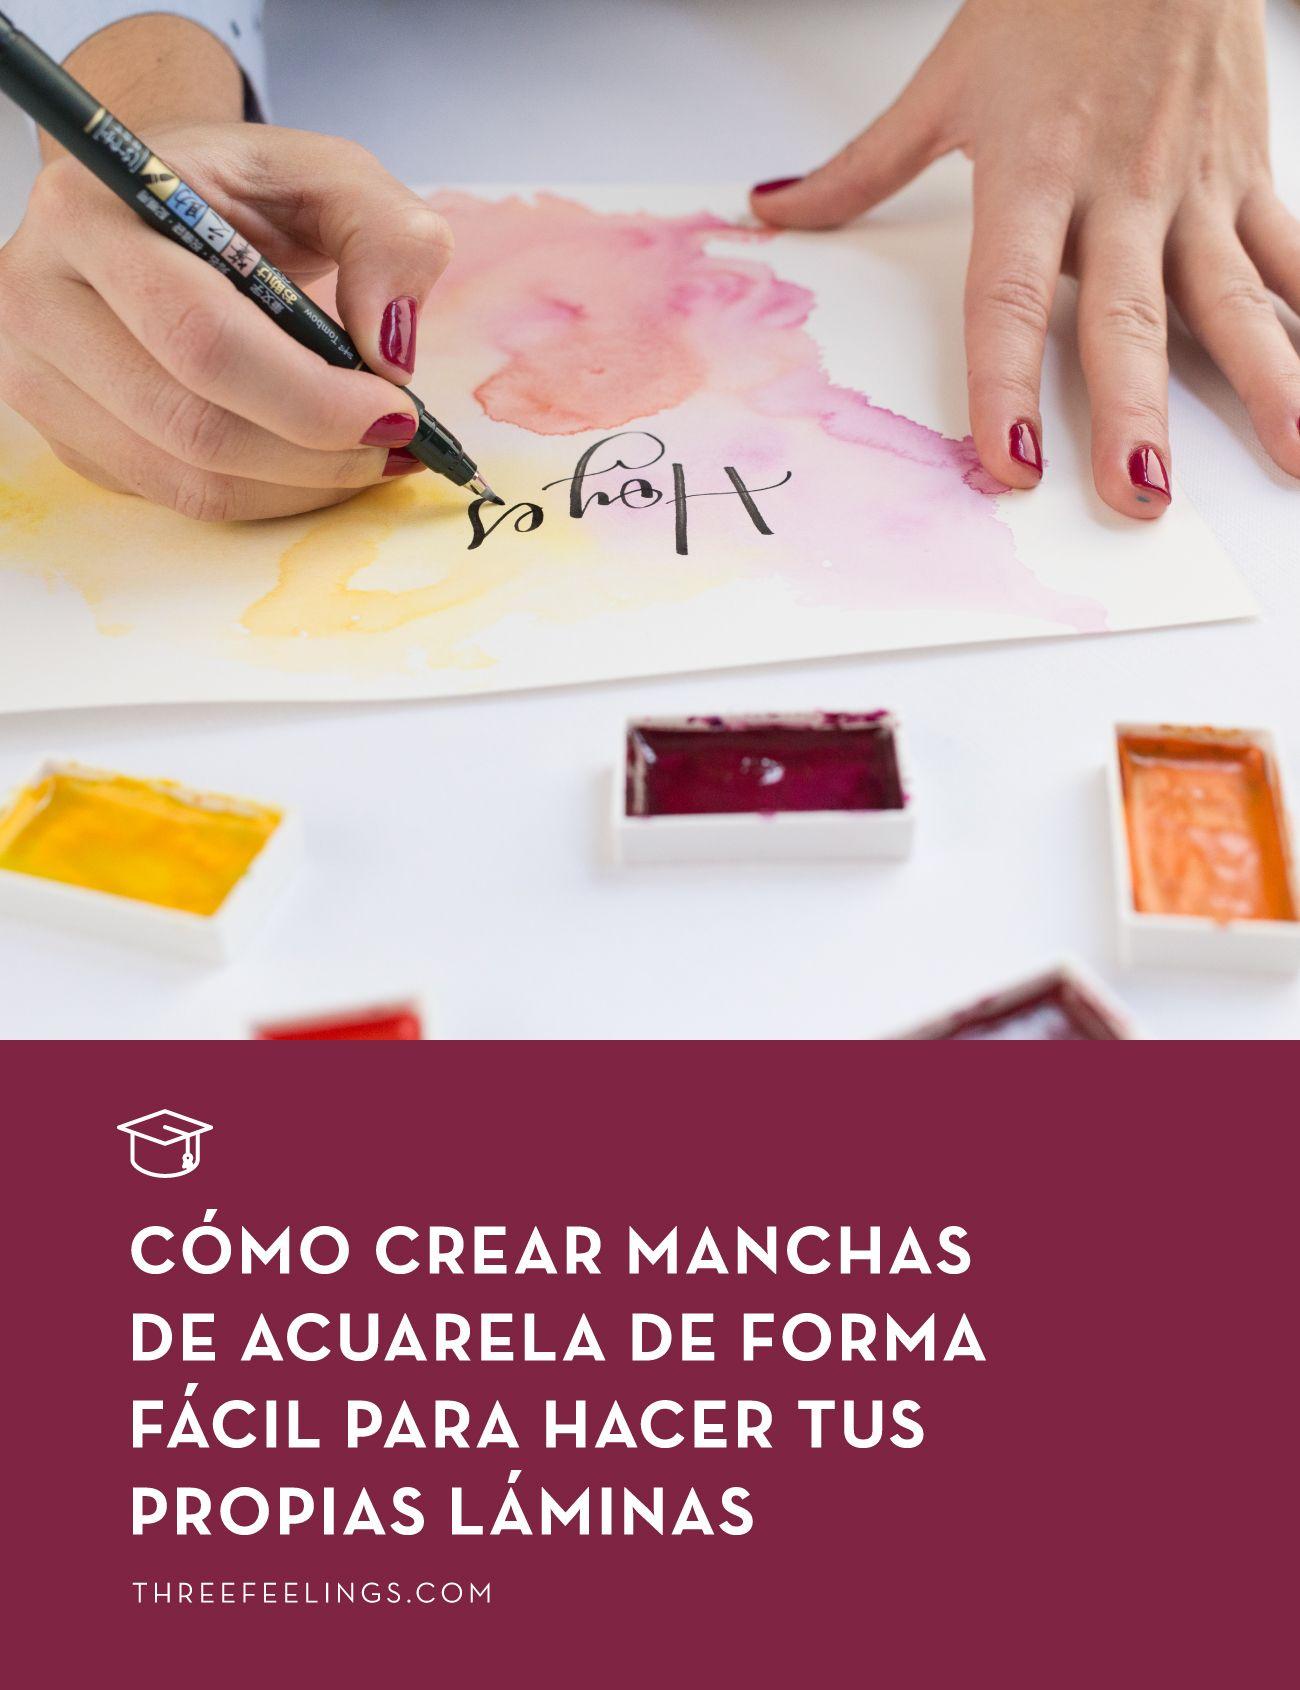 tutorial-crear-manchas-acuarela-tombow-irodori-threefeelings-00